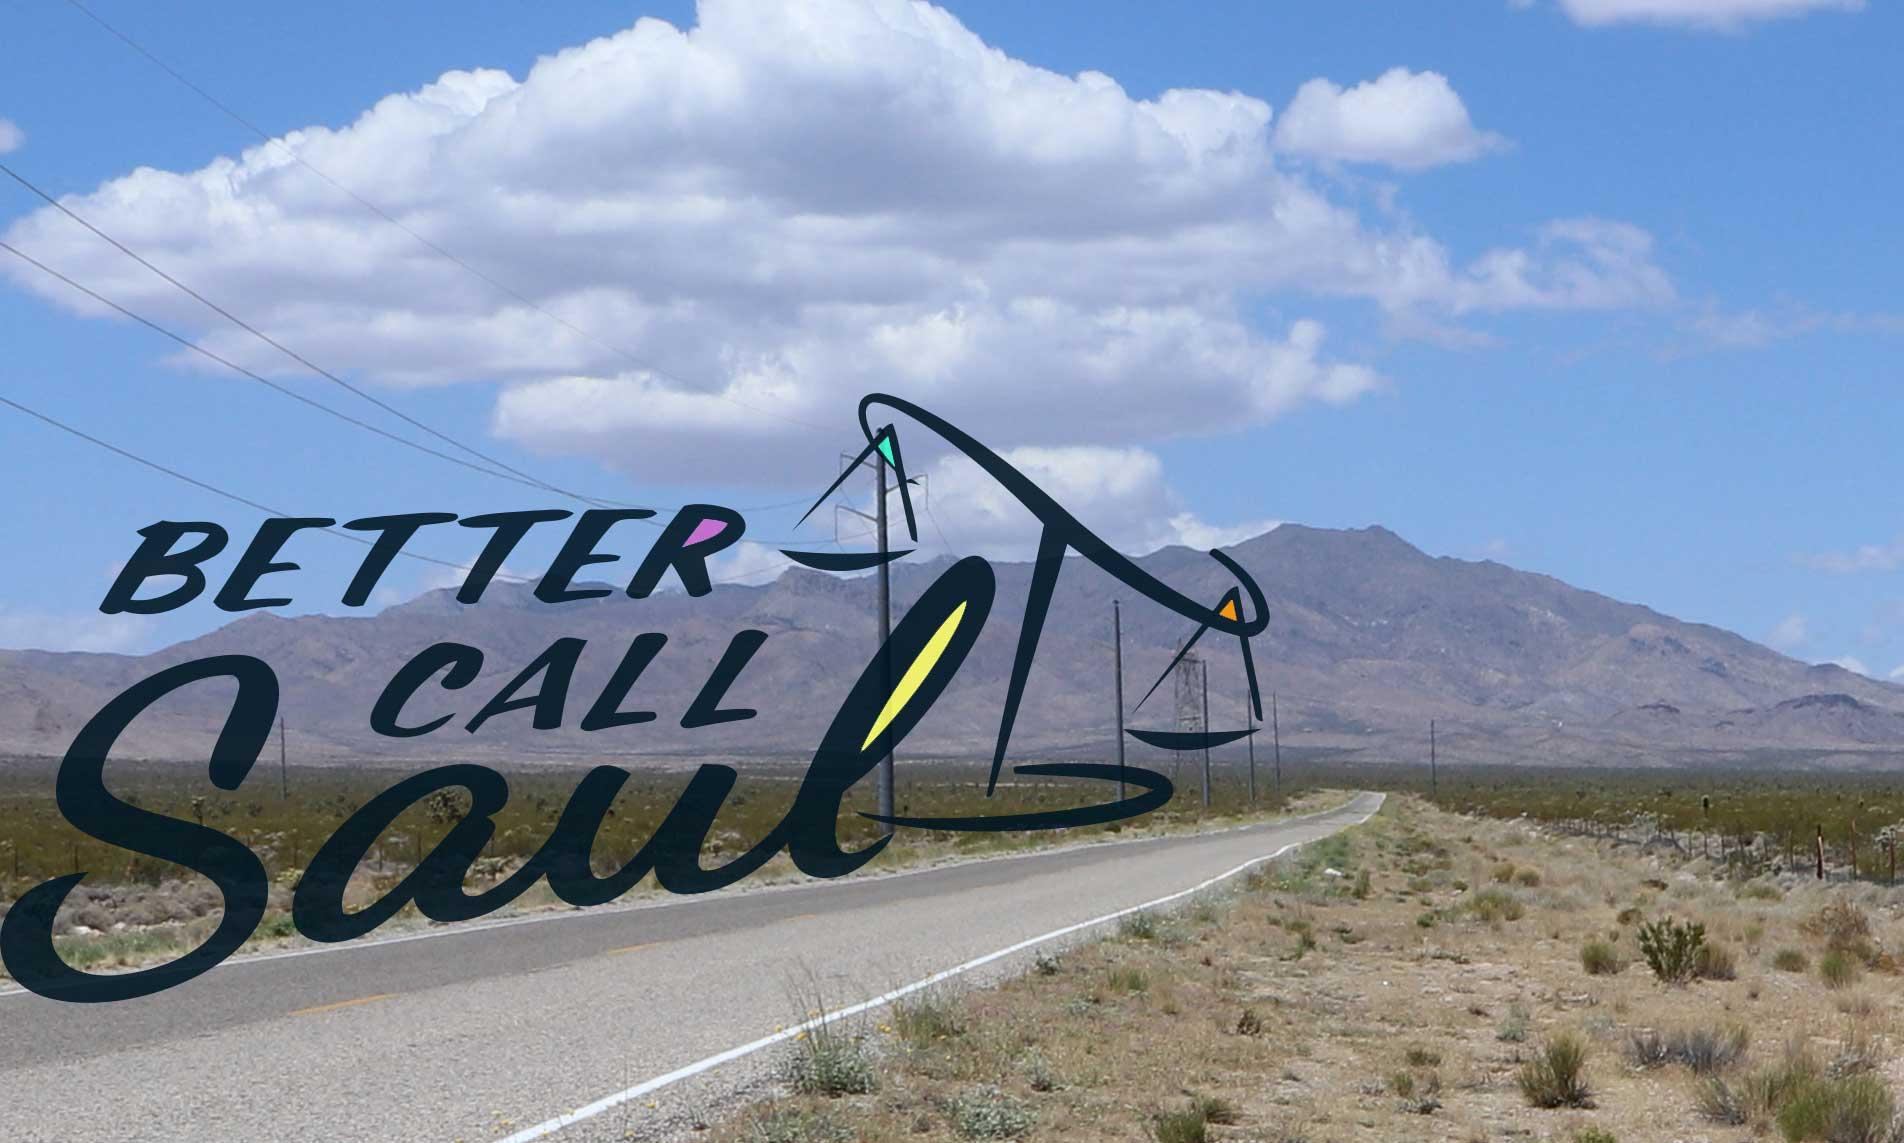 Better Call Saul seizoen 4 - Slippin' Jimmy is breaking bad